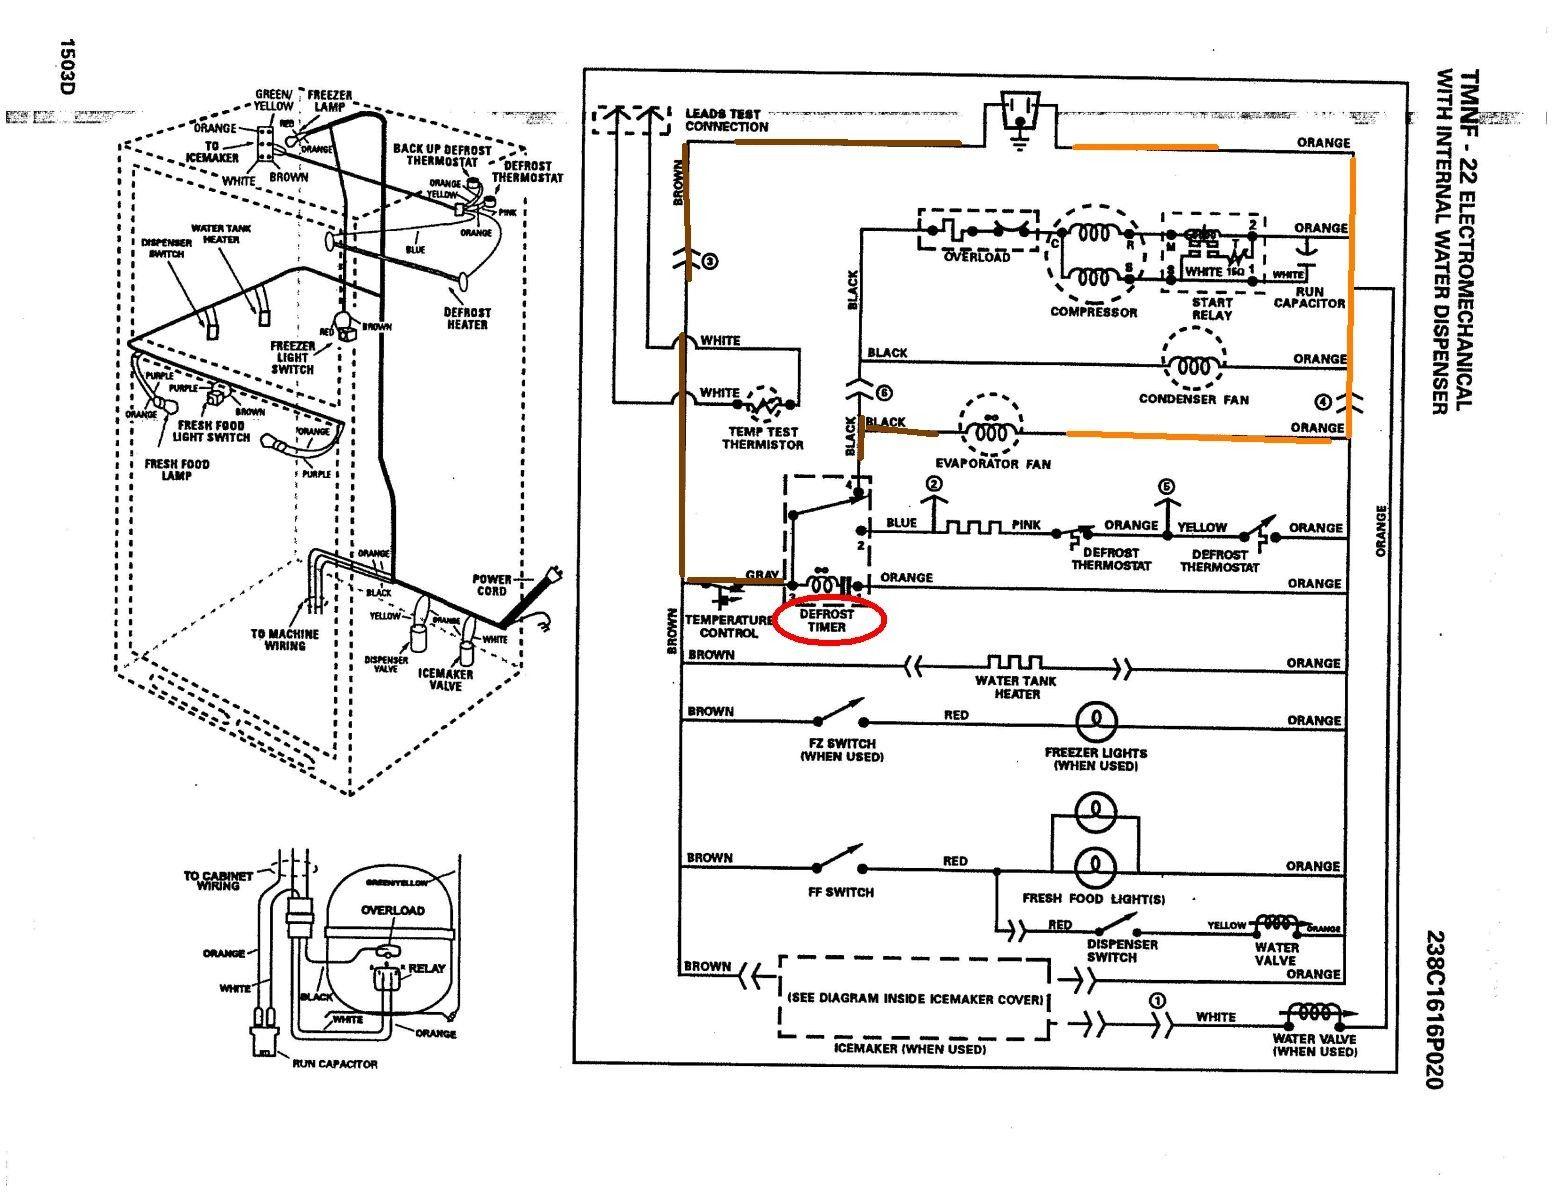 Ge Refrigerator Wiring Diagram In